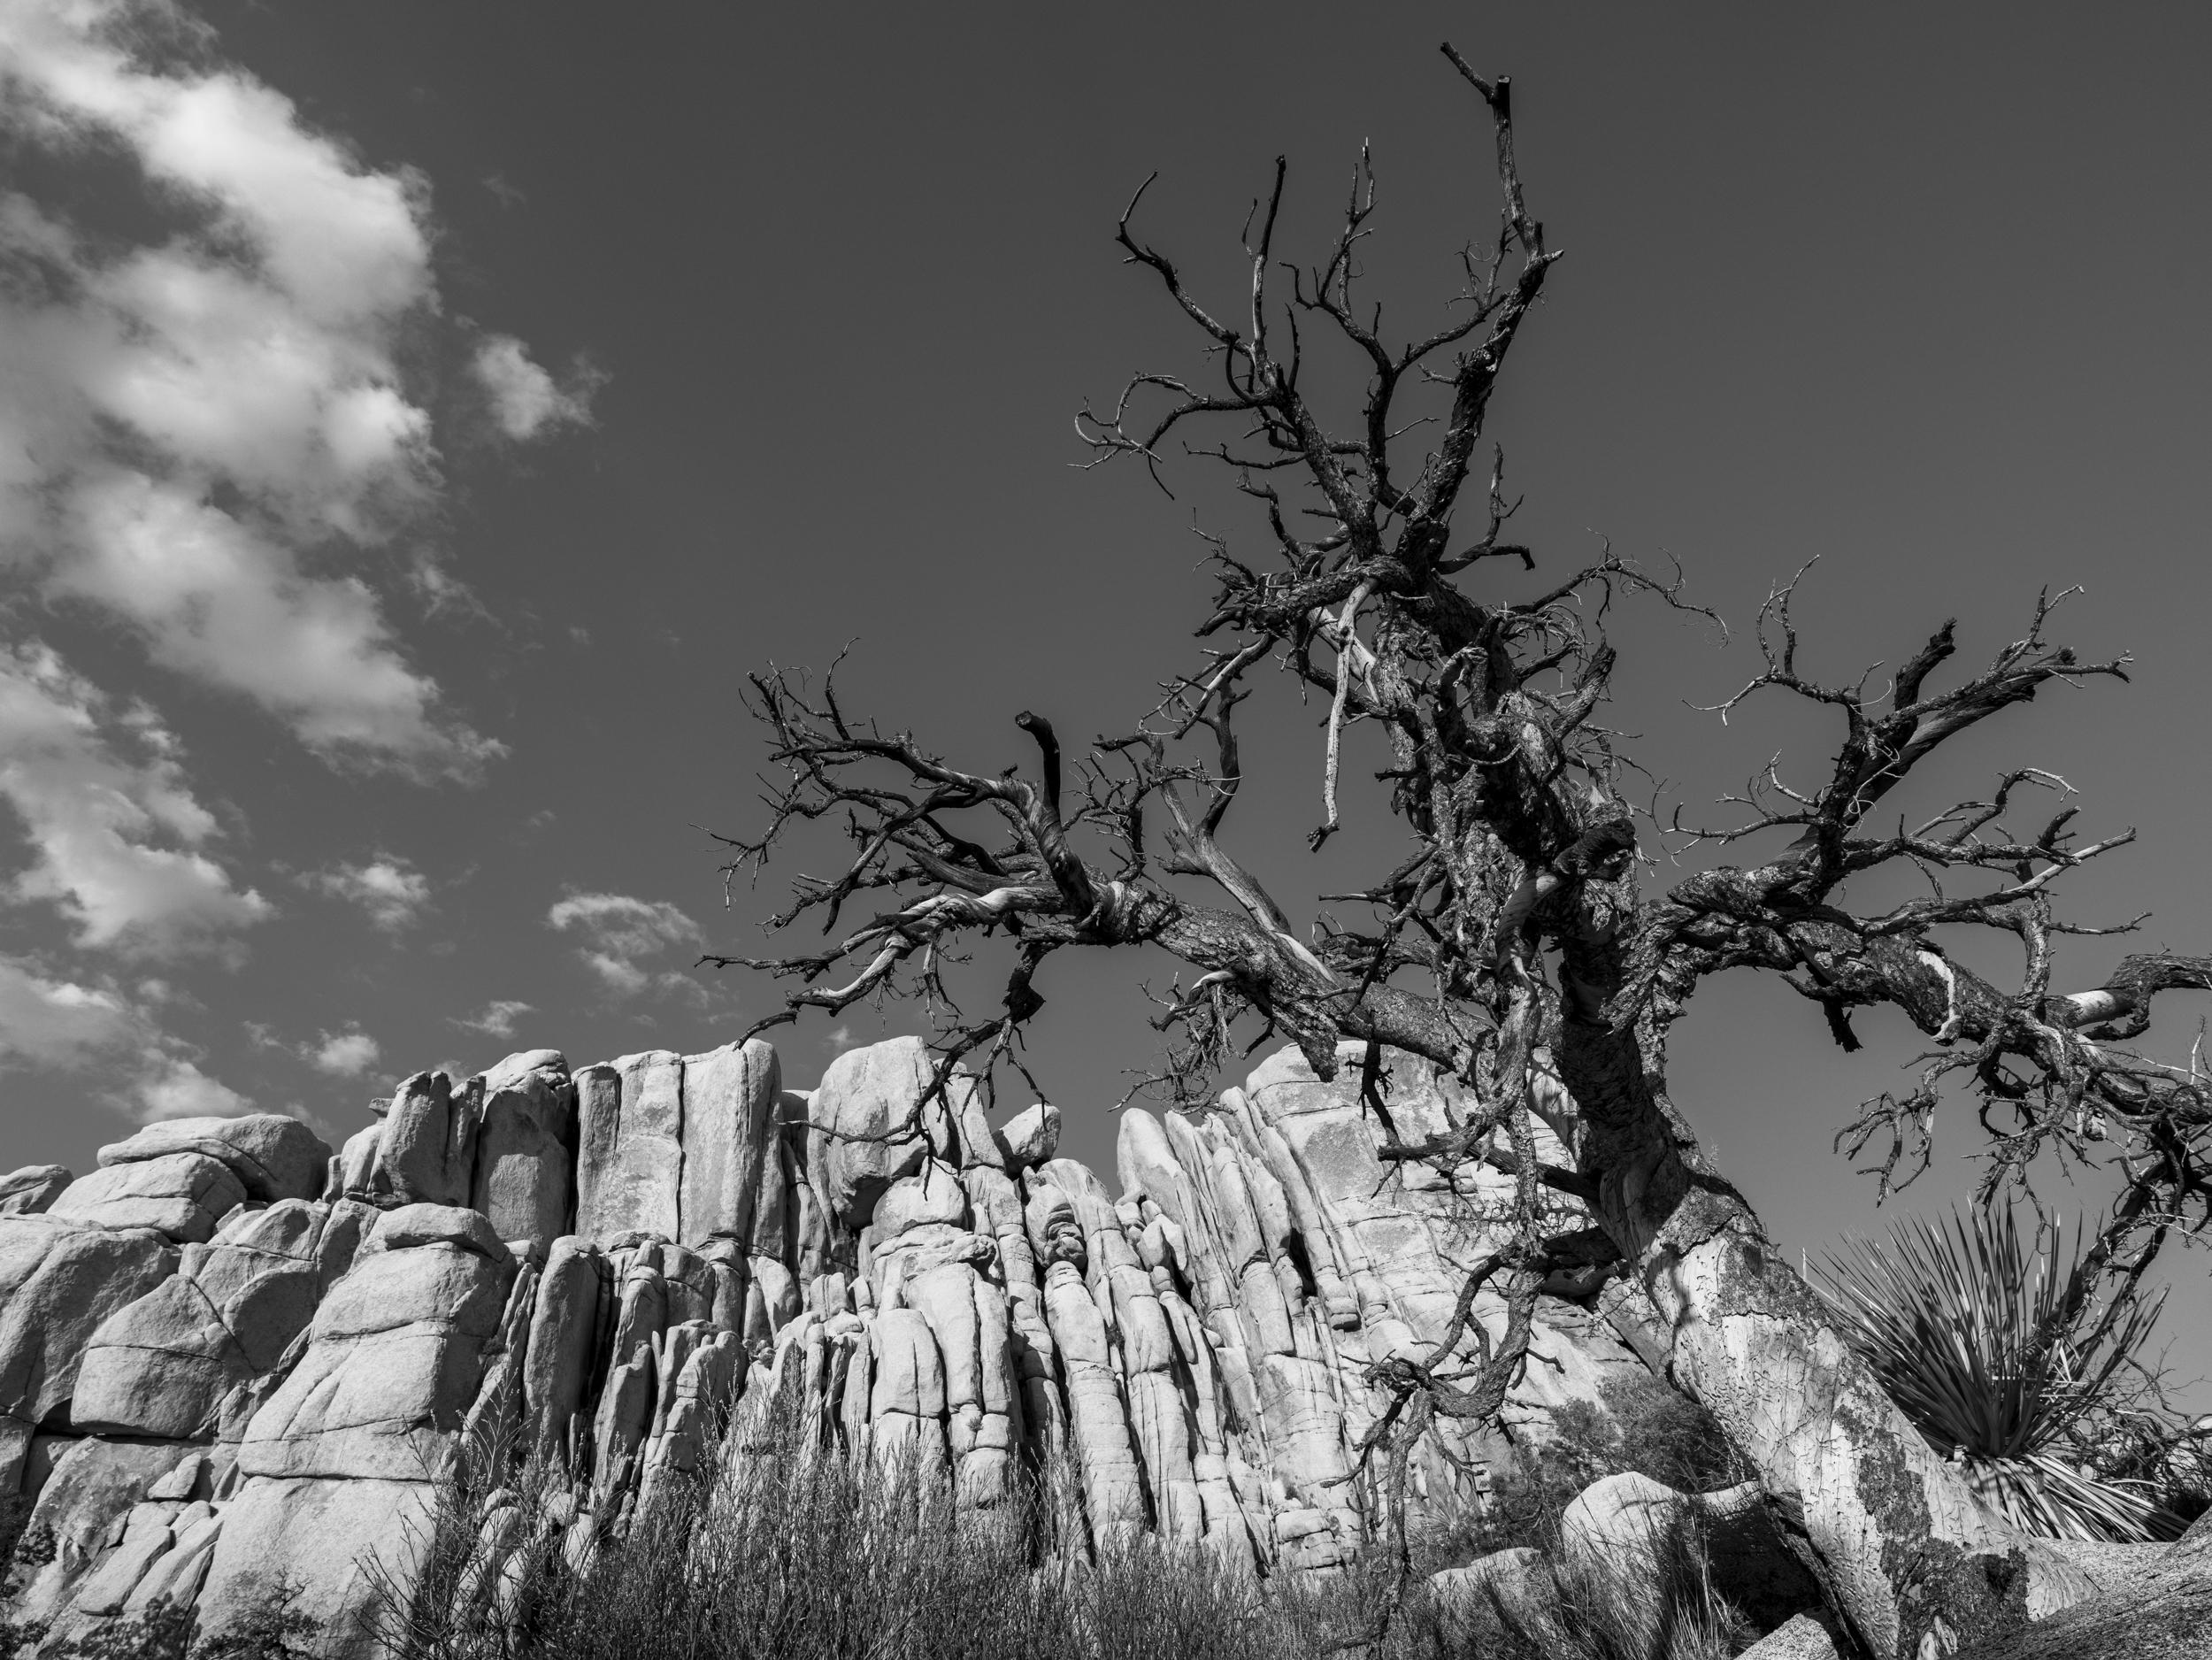 joshua tree 6 image